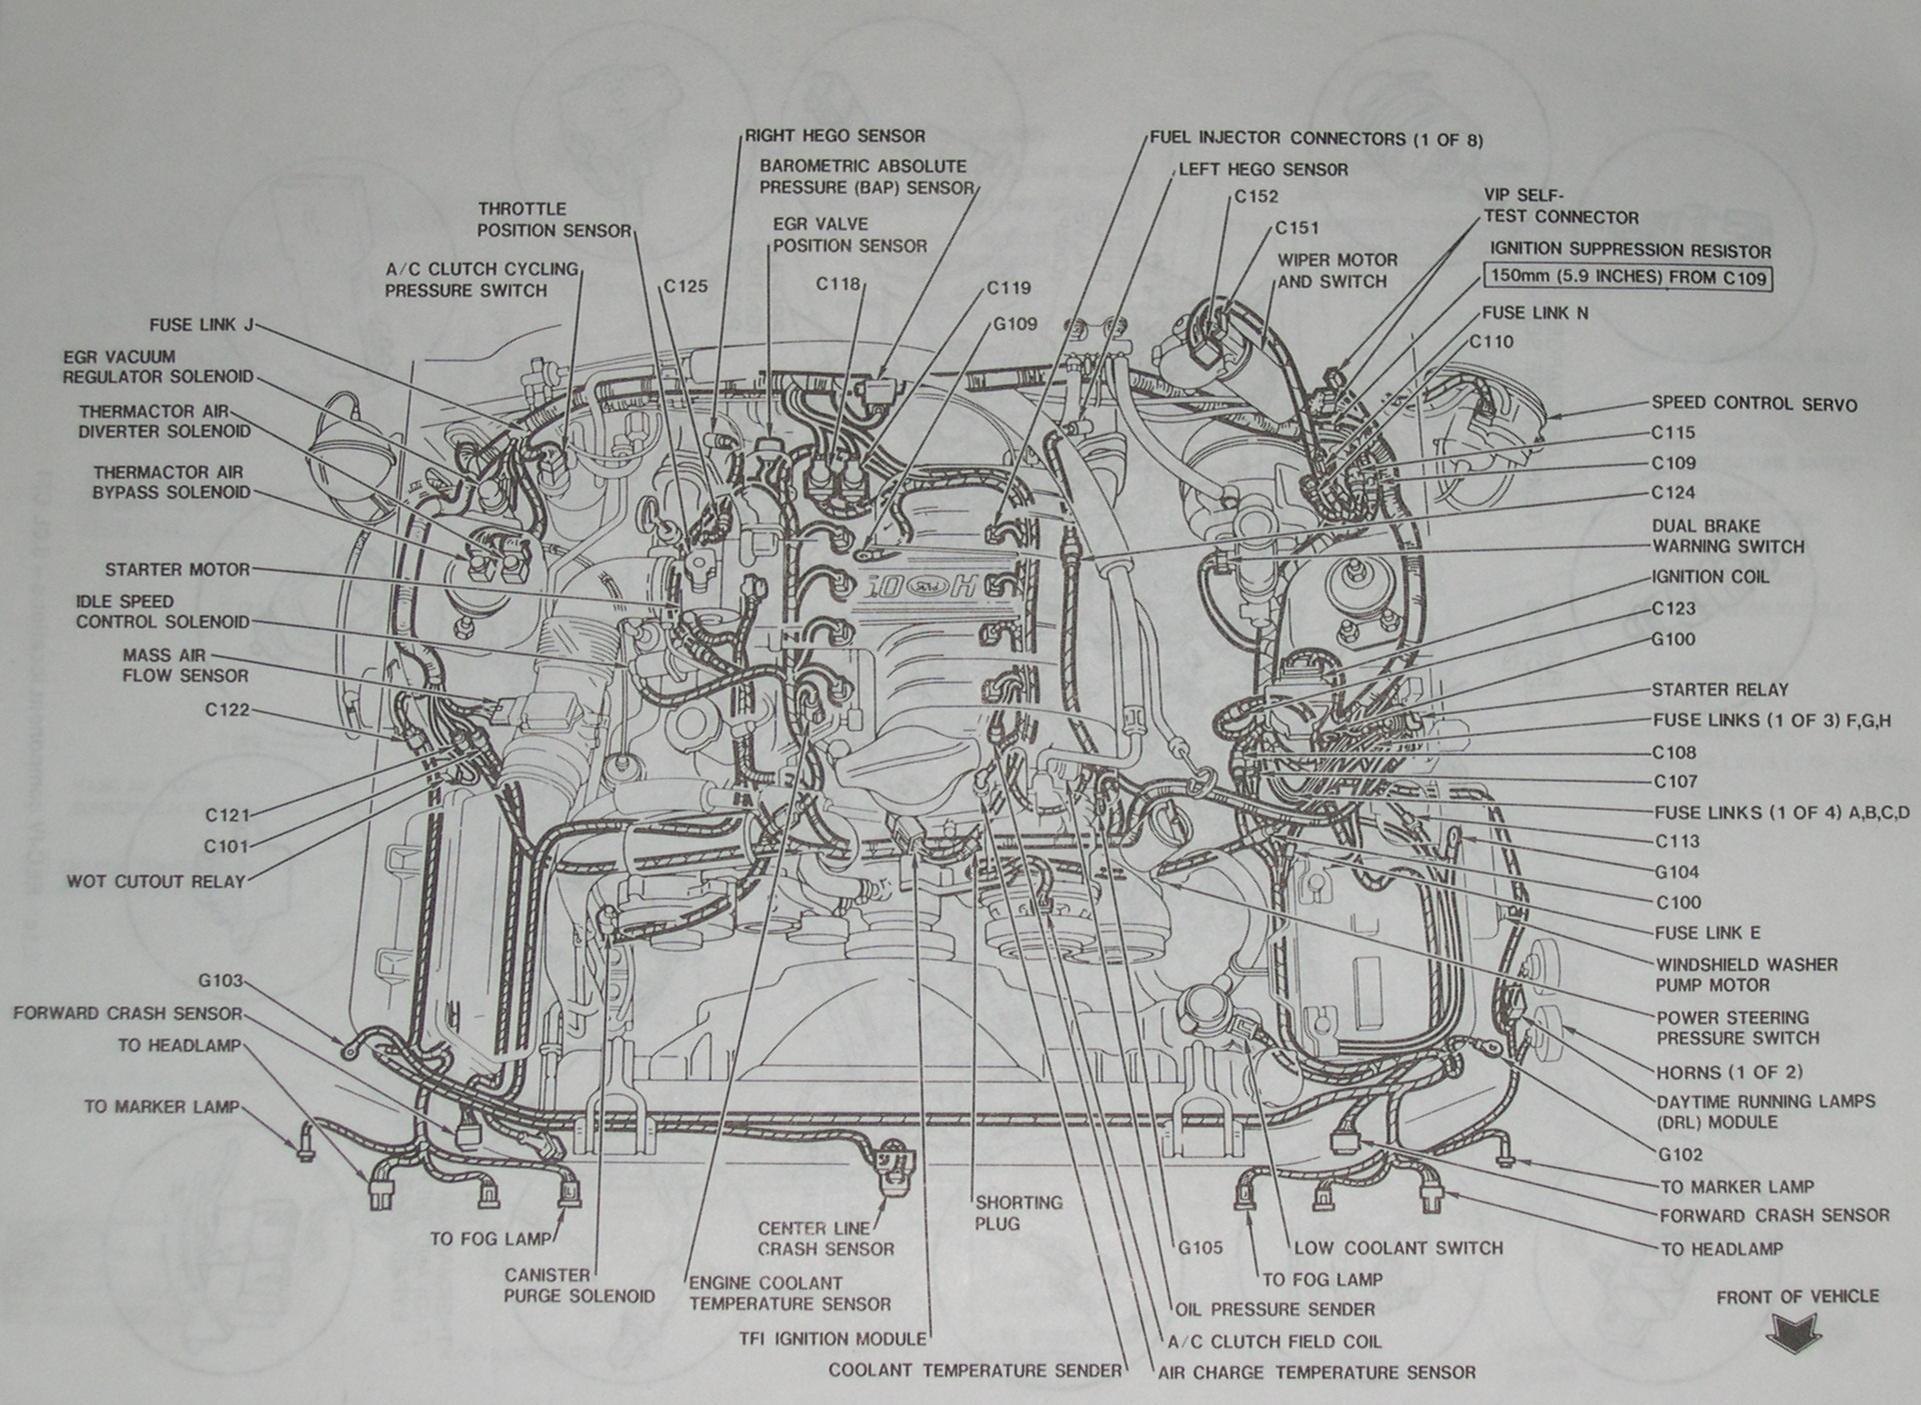 Ford Mustang 302 Alternator Wiring Harnes Diagram - Wiring Diagram | Ford Mustang 302 Alternator Wiring Harness Diagram |  | Wiring Diagram